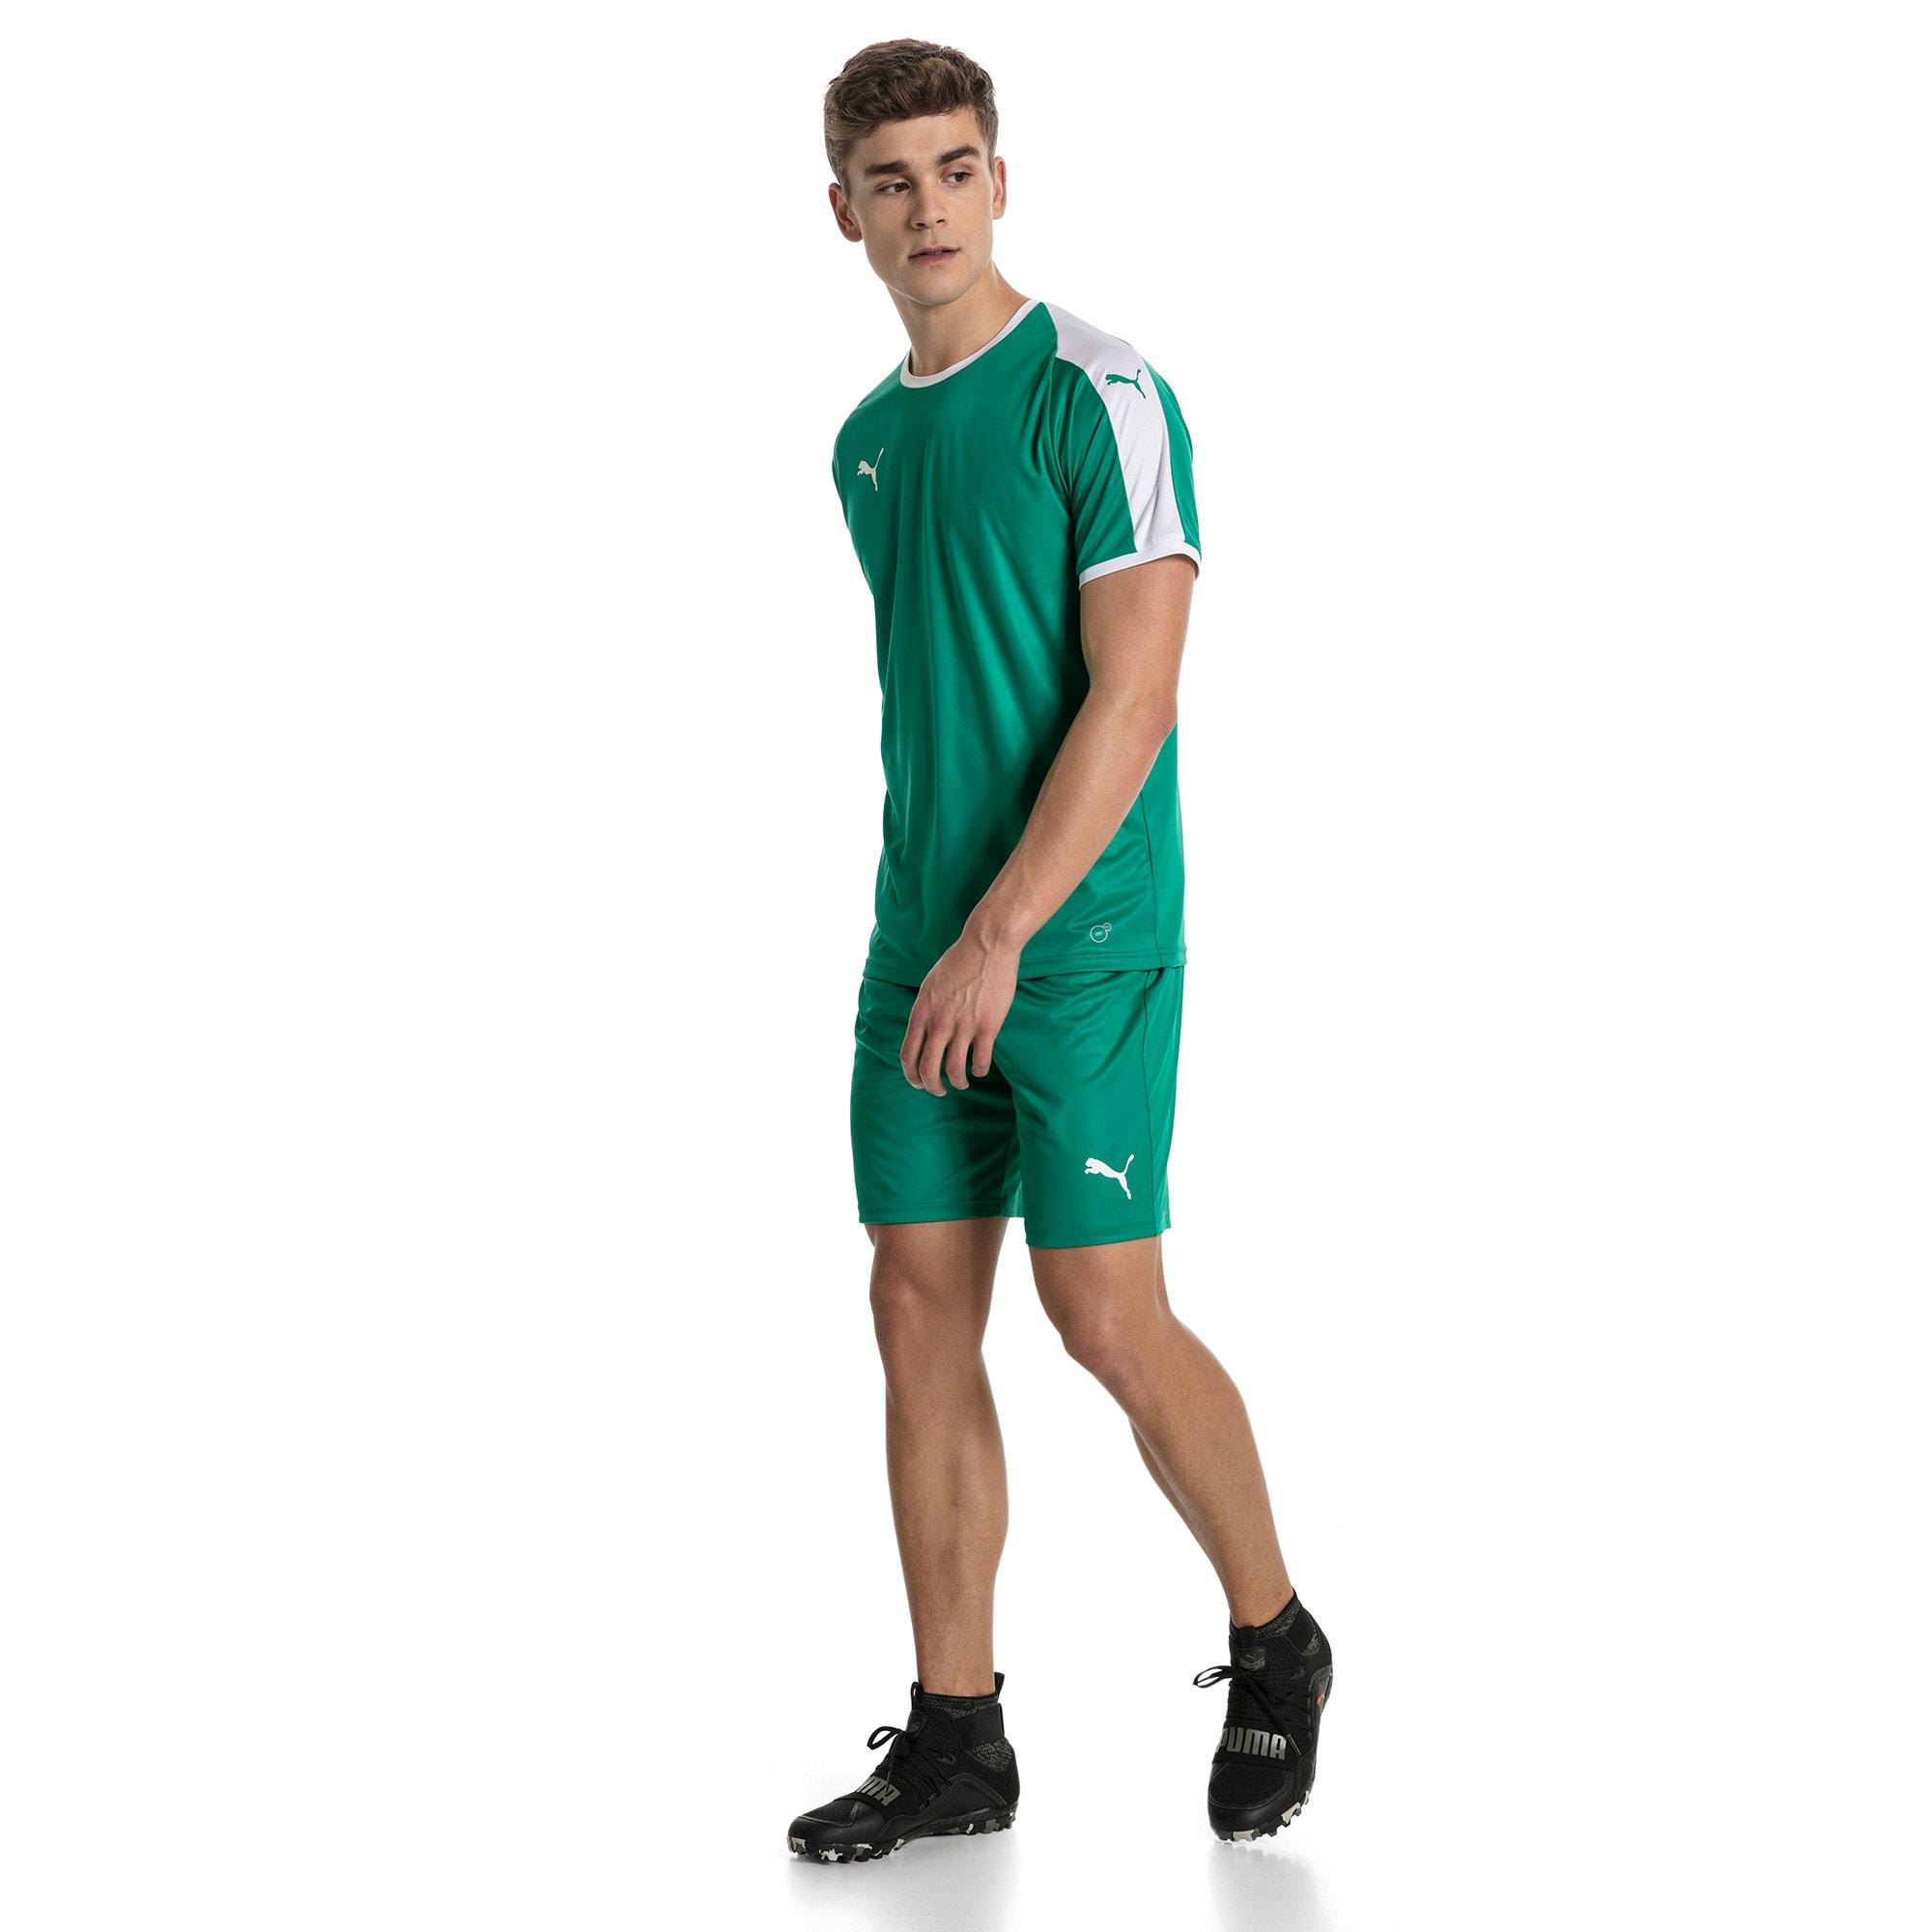 Thumbnail 5 of Liga Core Men's Shorts, Pepper Green-Puma White, medium